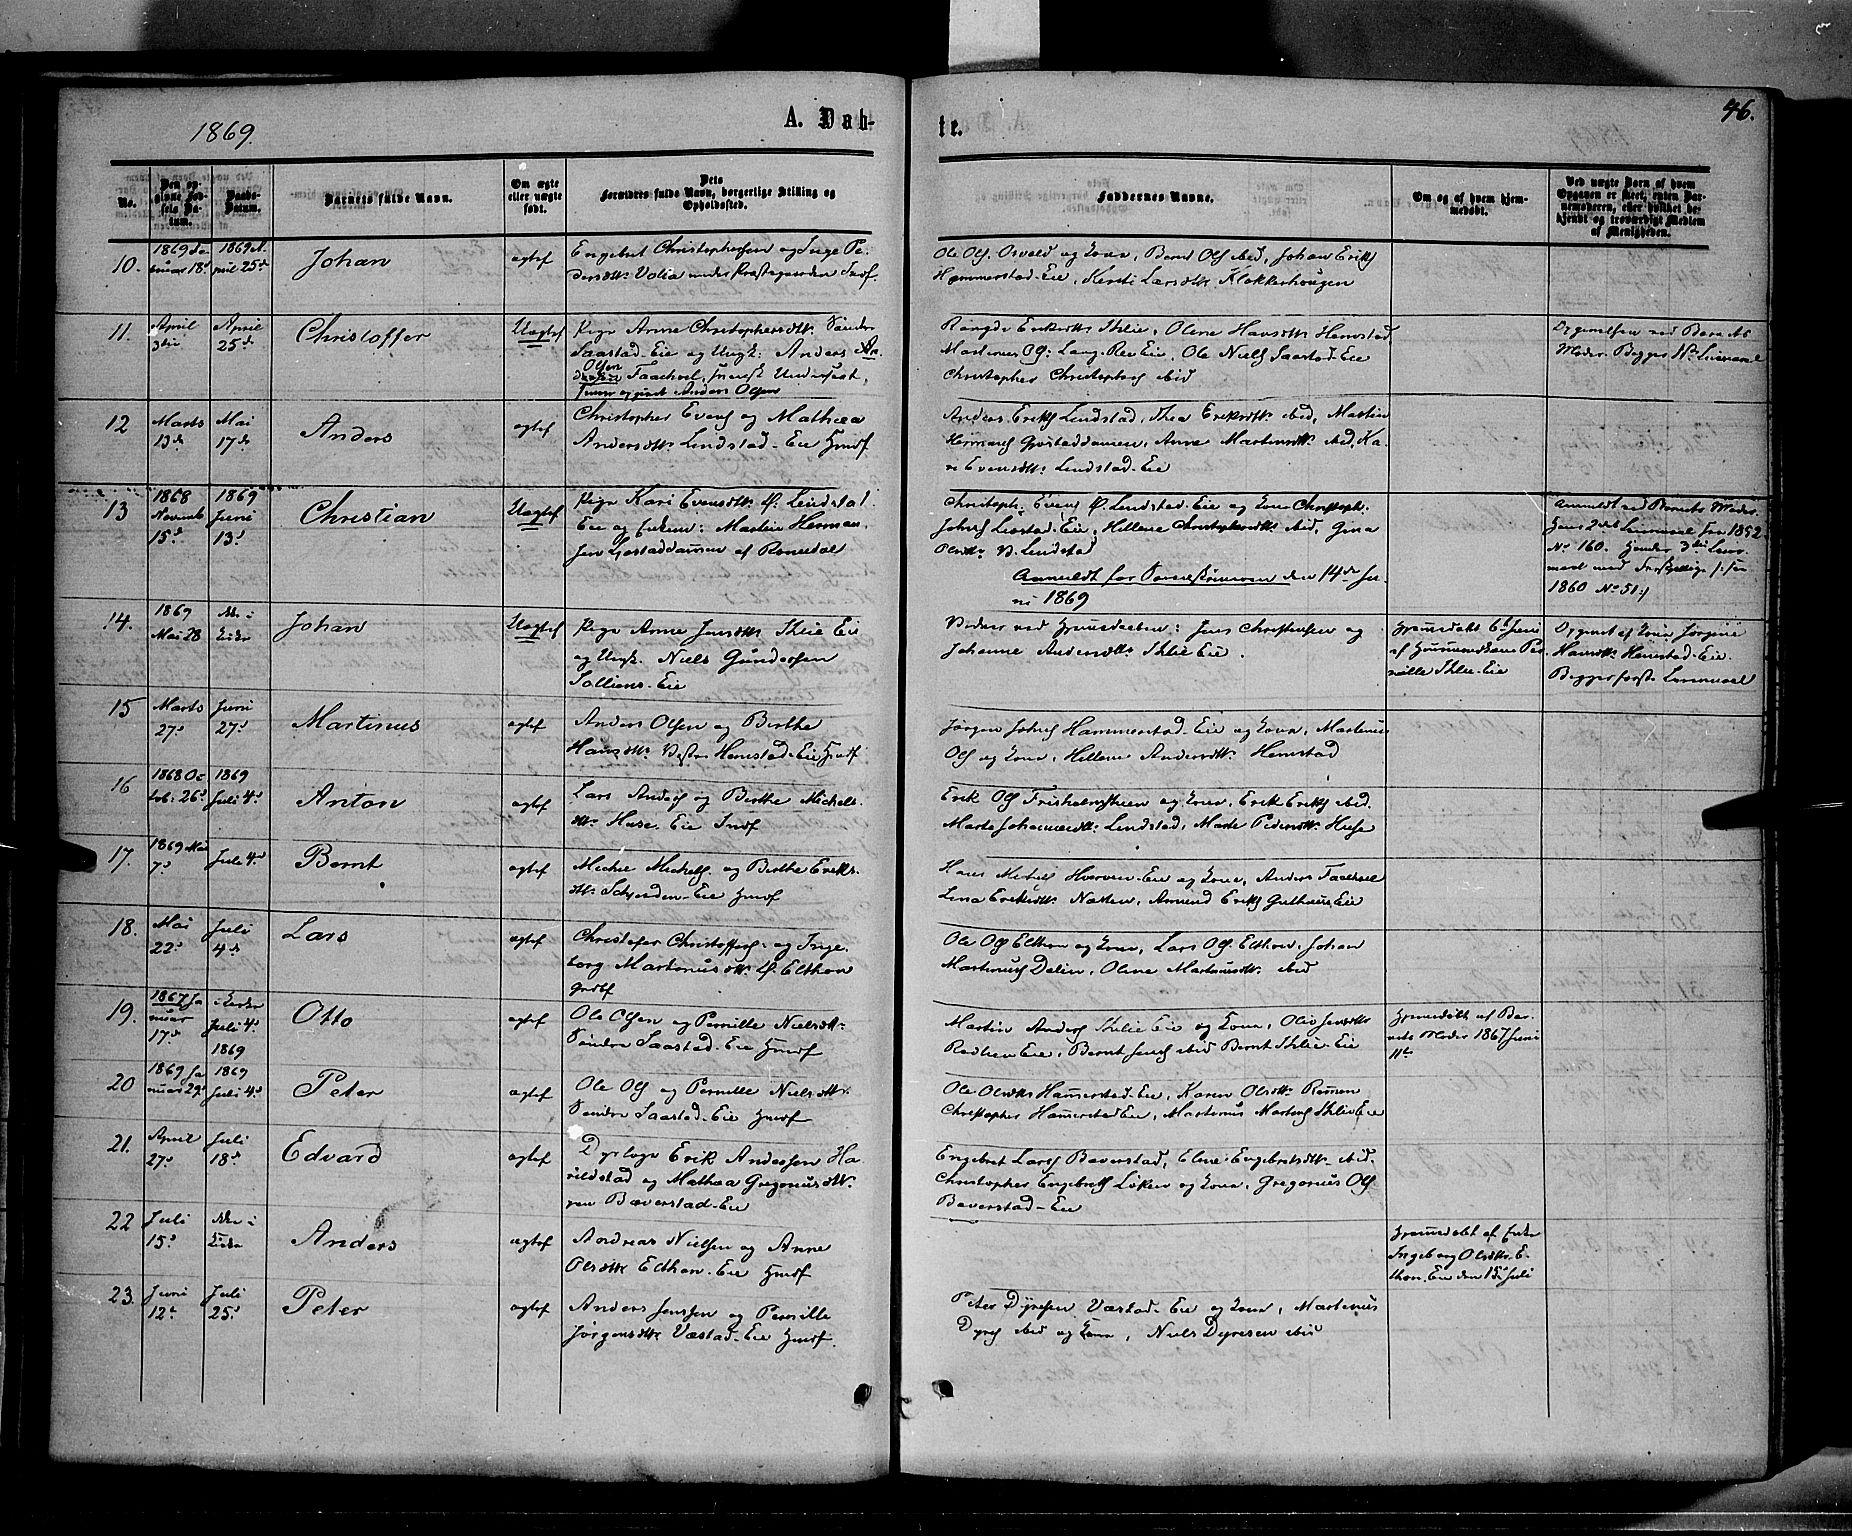 SAH, Stange prestekontor, K/L0013: Ministerialbok nr. 13, 1862-1879, s. 46